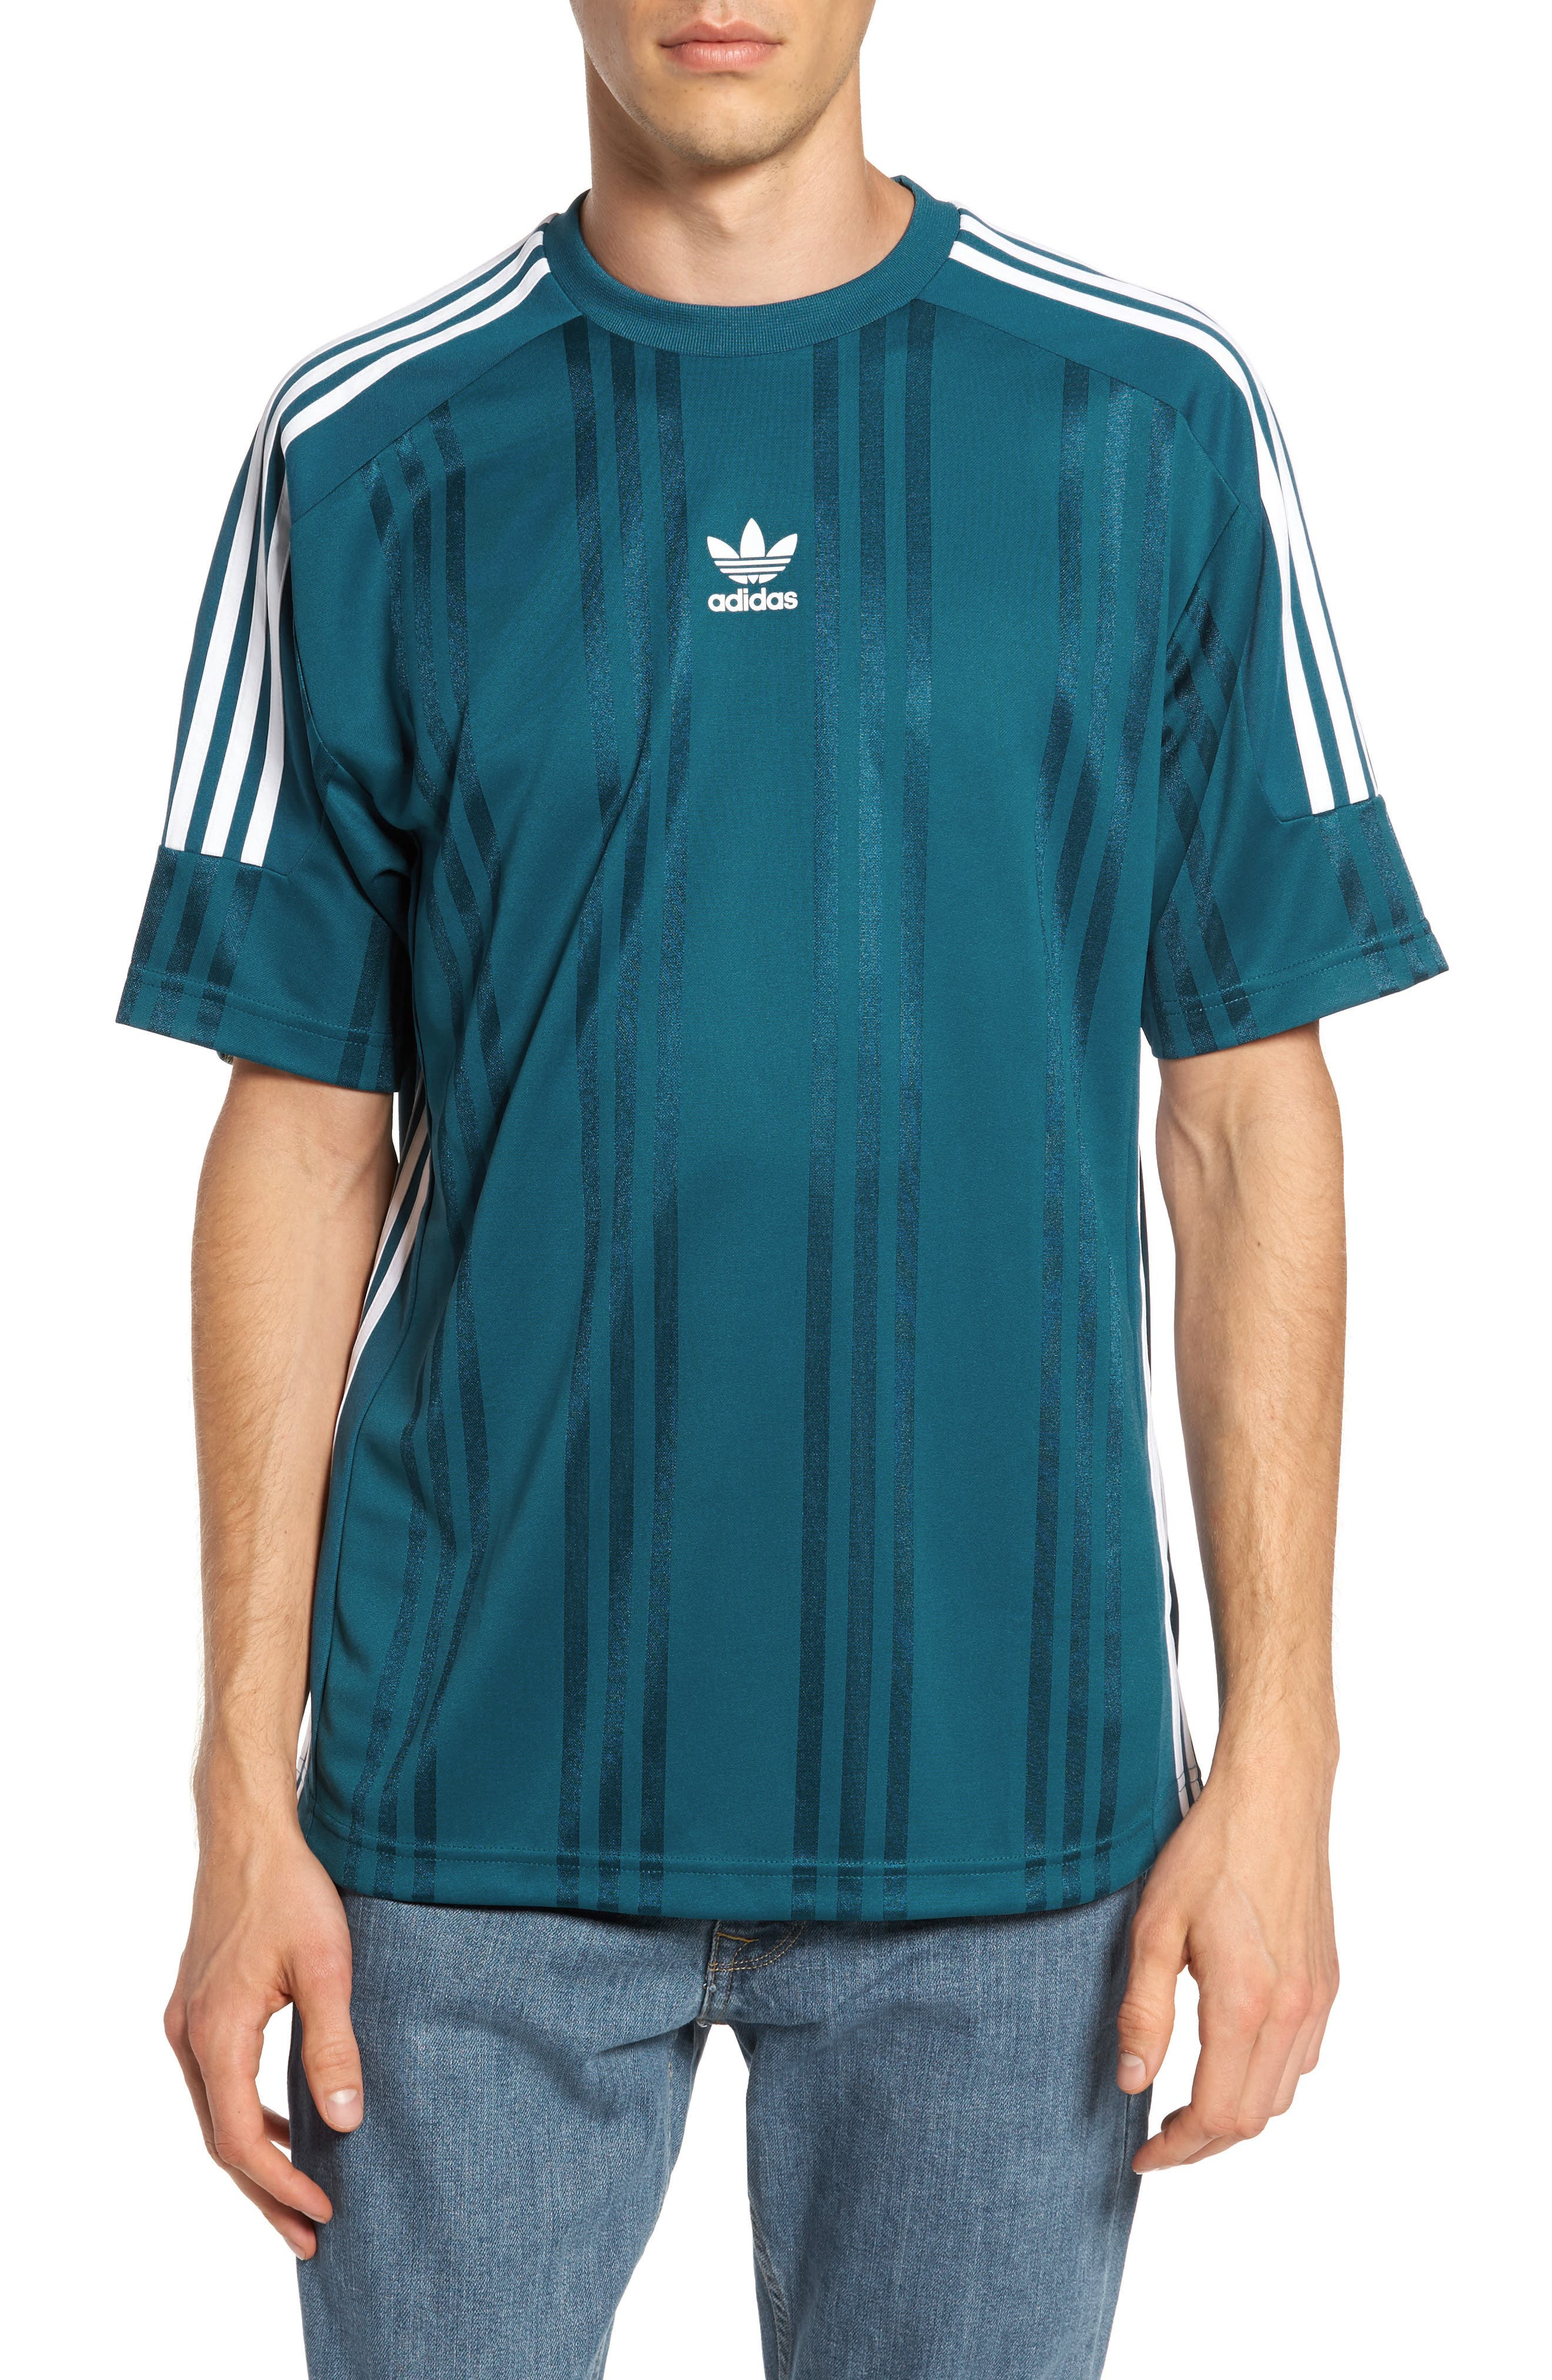 Originals Jacquard Stripe T-Shirt,                         Main,                         color, Real Teal